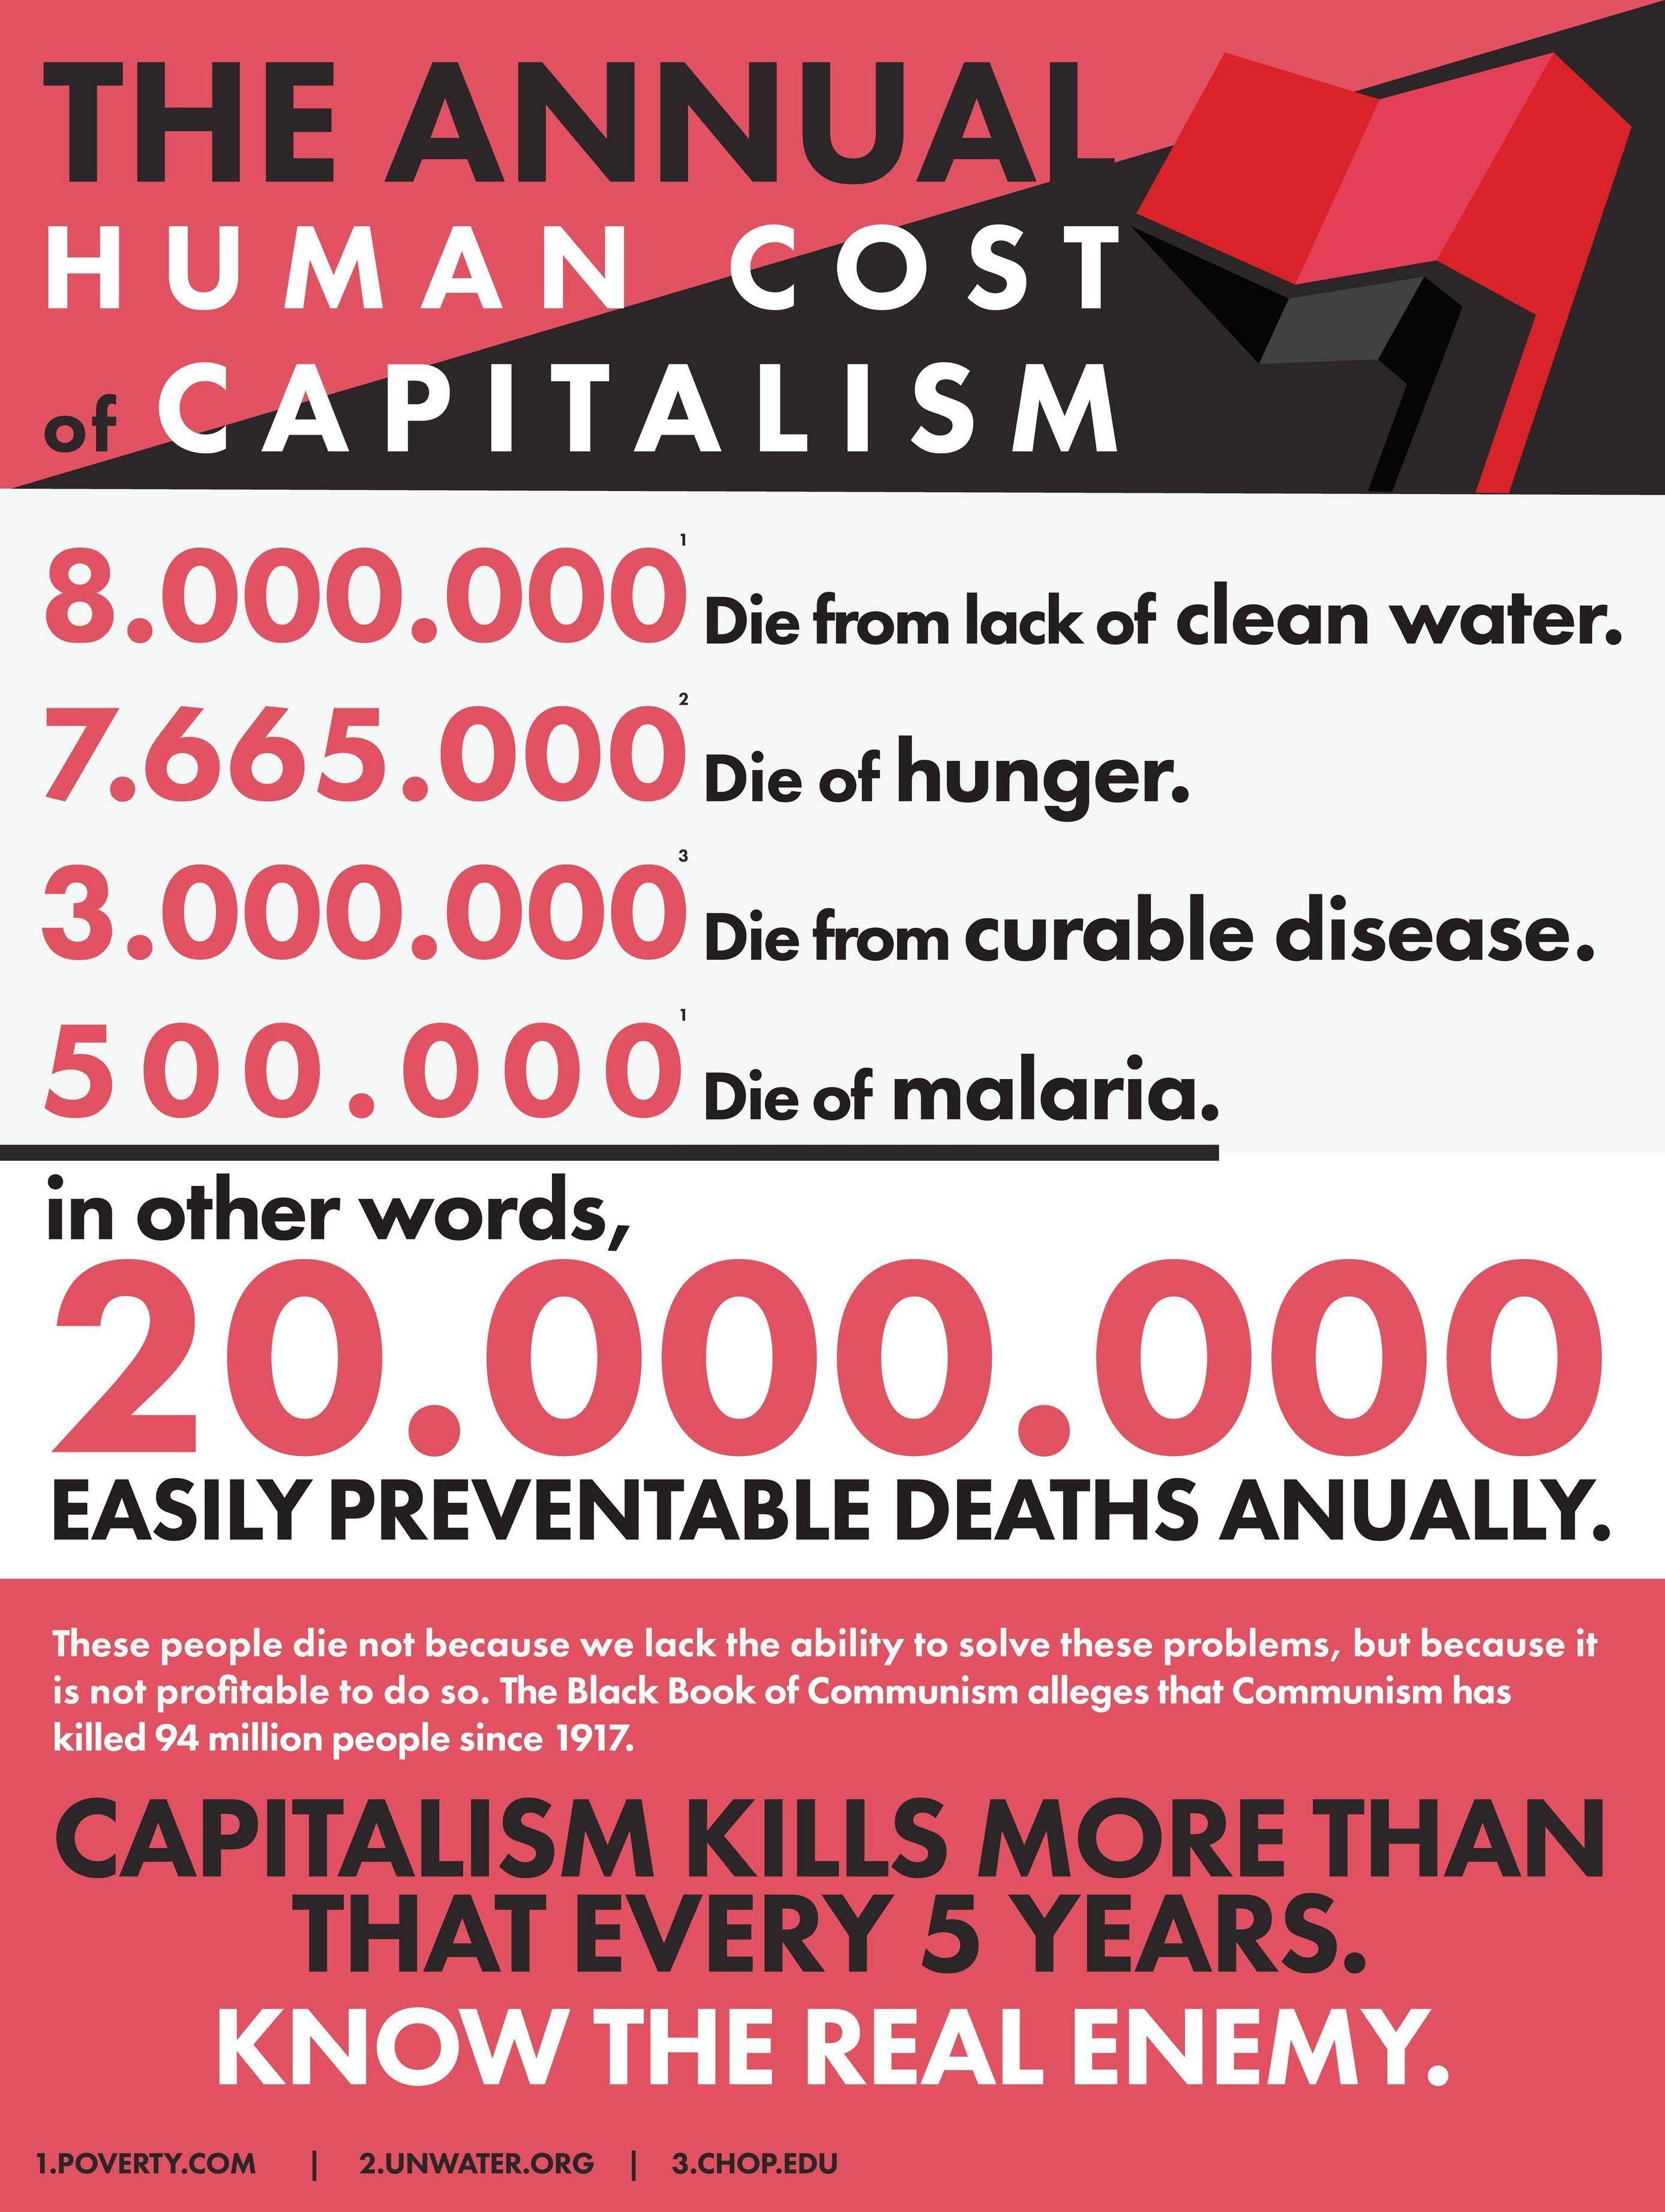 Human cost of capitalism